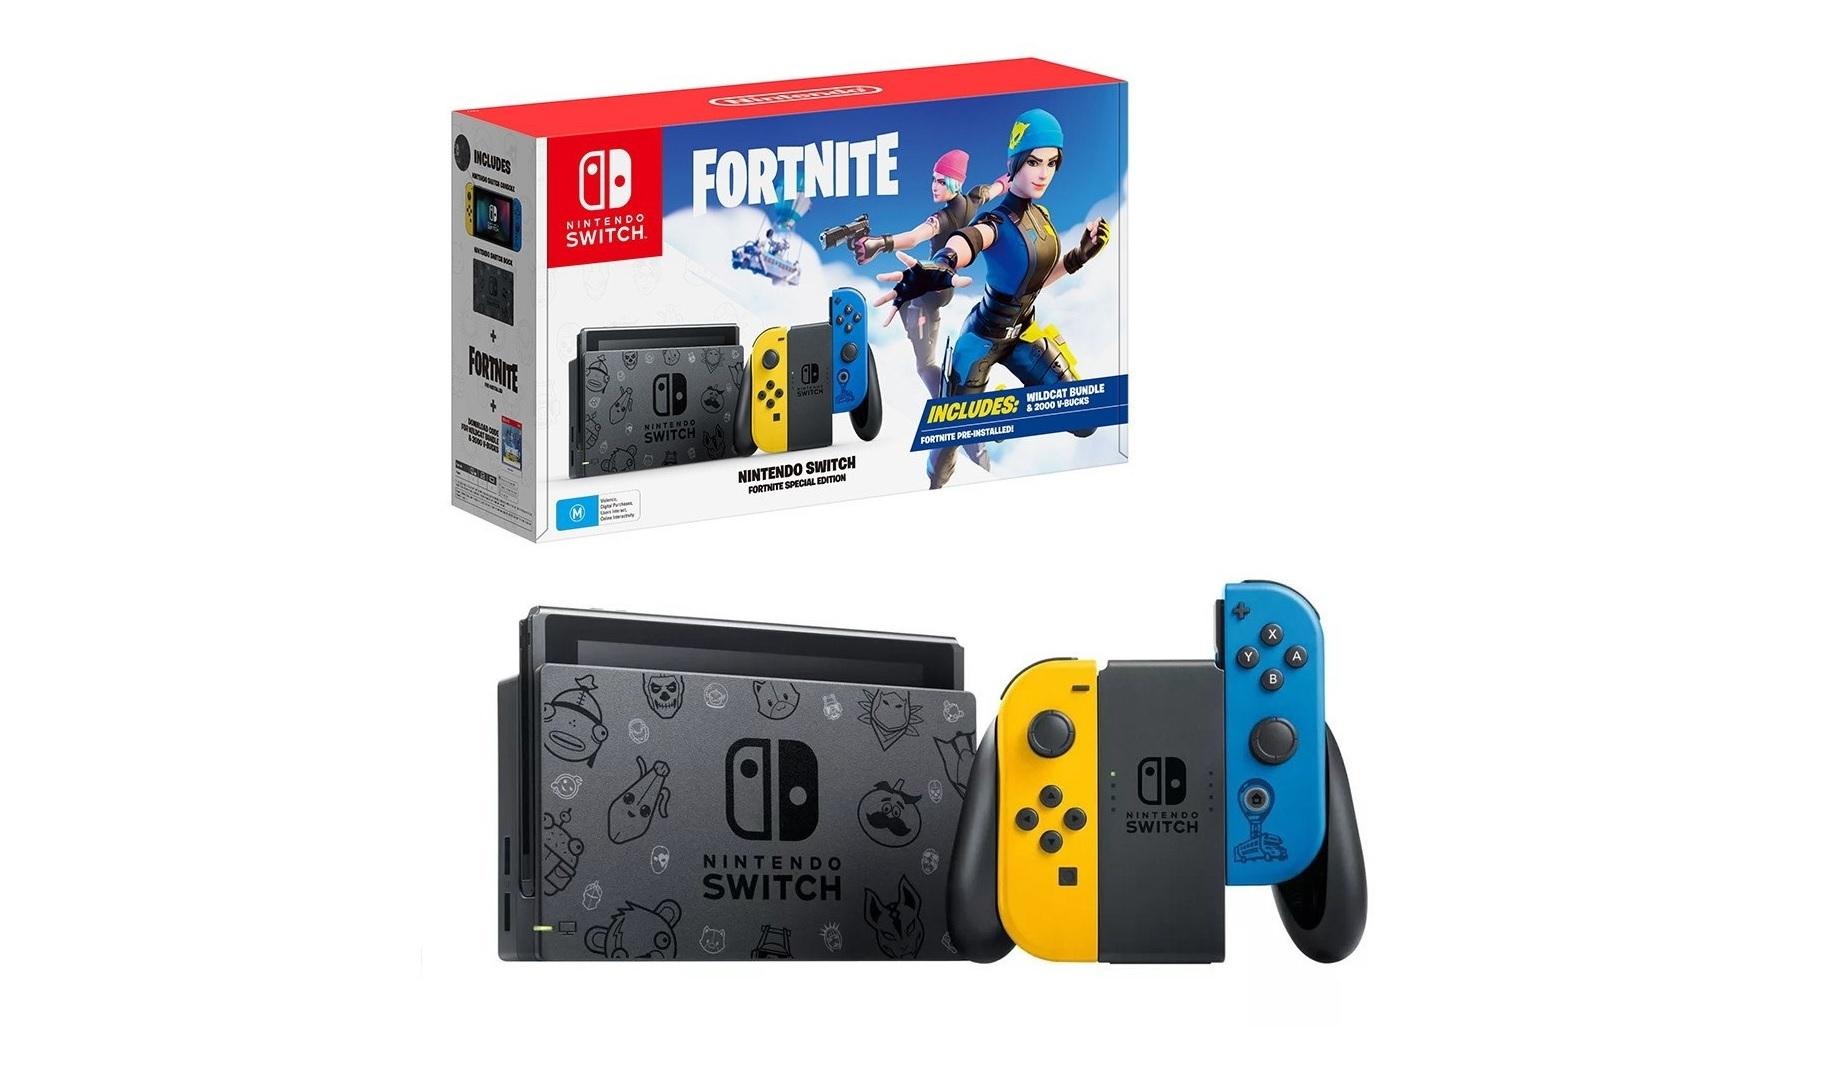 Fortnite And Switch Nintendo Switch Fortnite Wildcat Bundle Treasure Island Group Turkey Jordan Morocco Kenya